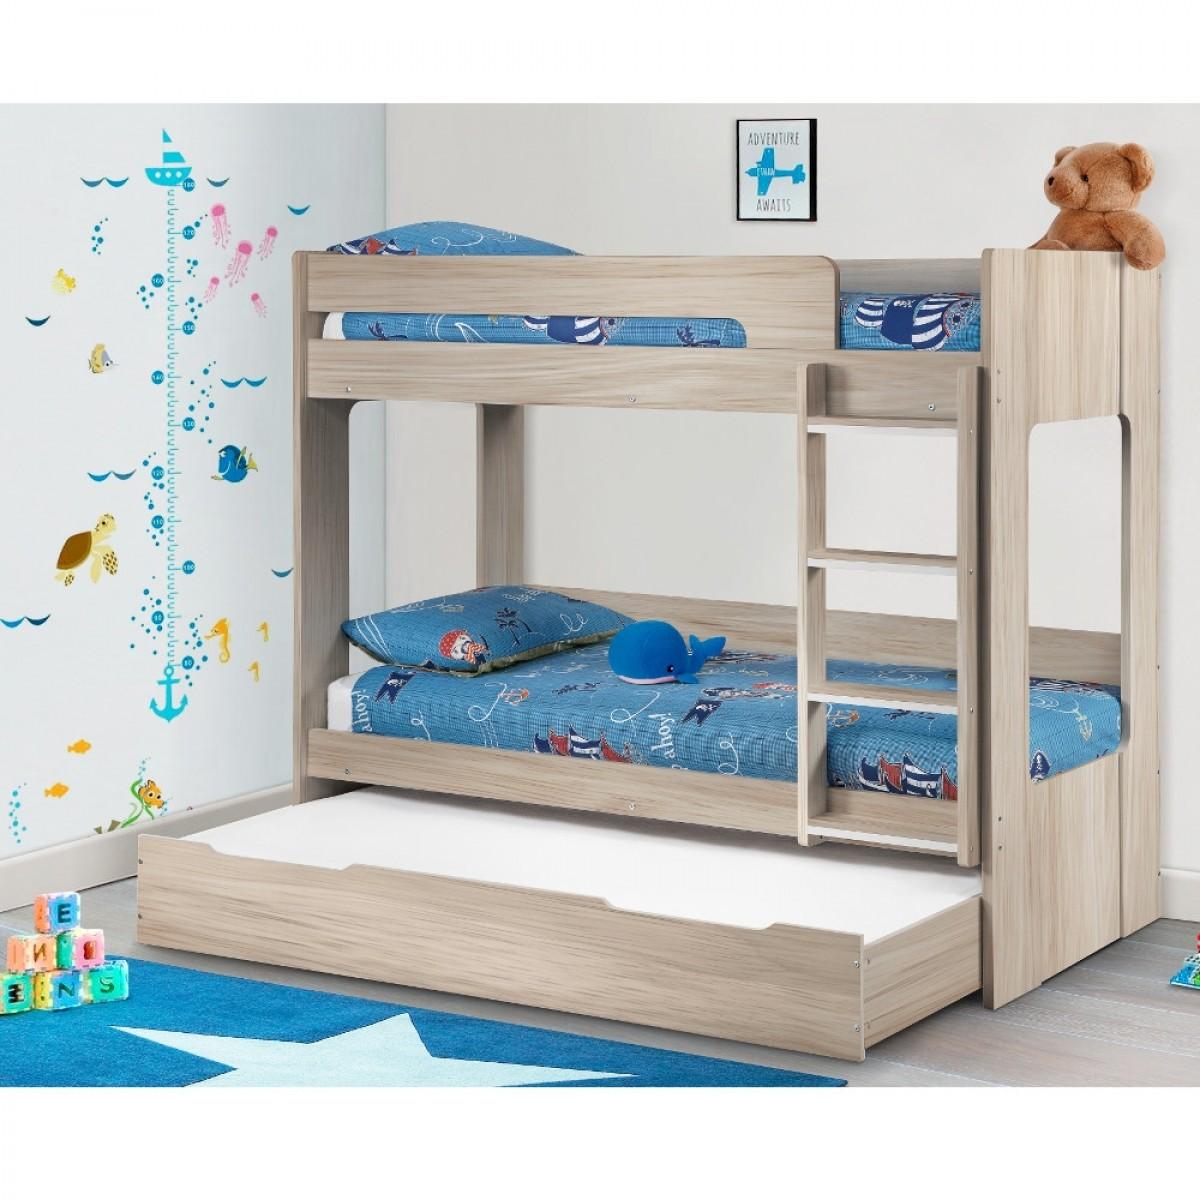 Ellie Oak Wooden Bunk Bed And Trundle Guest Bed Underbed Storage Drawer